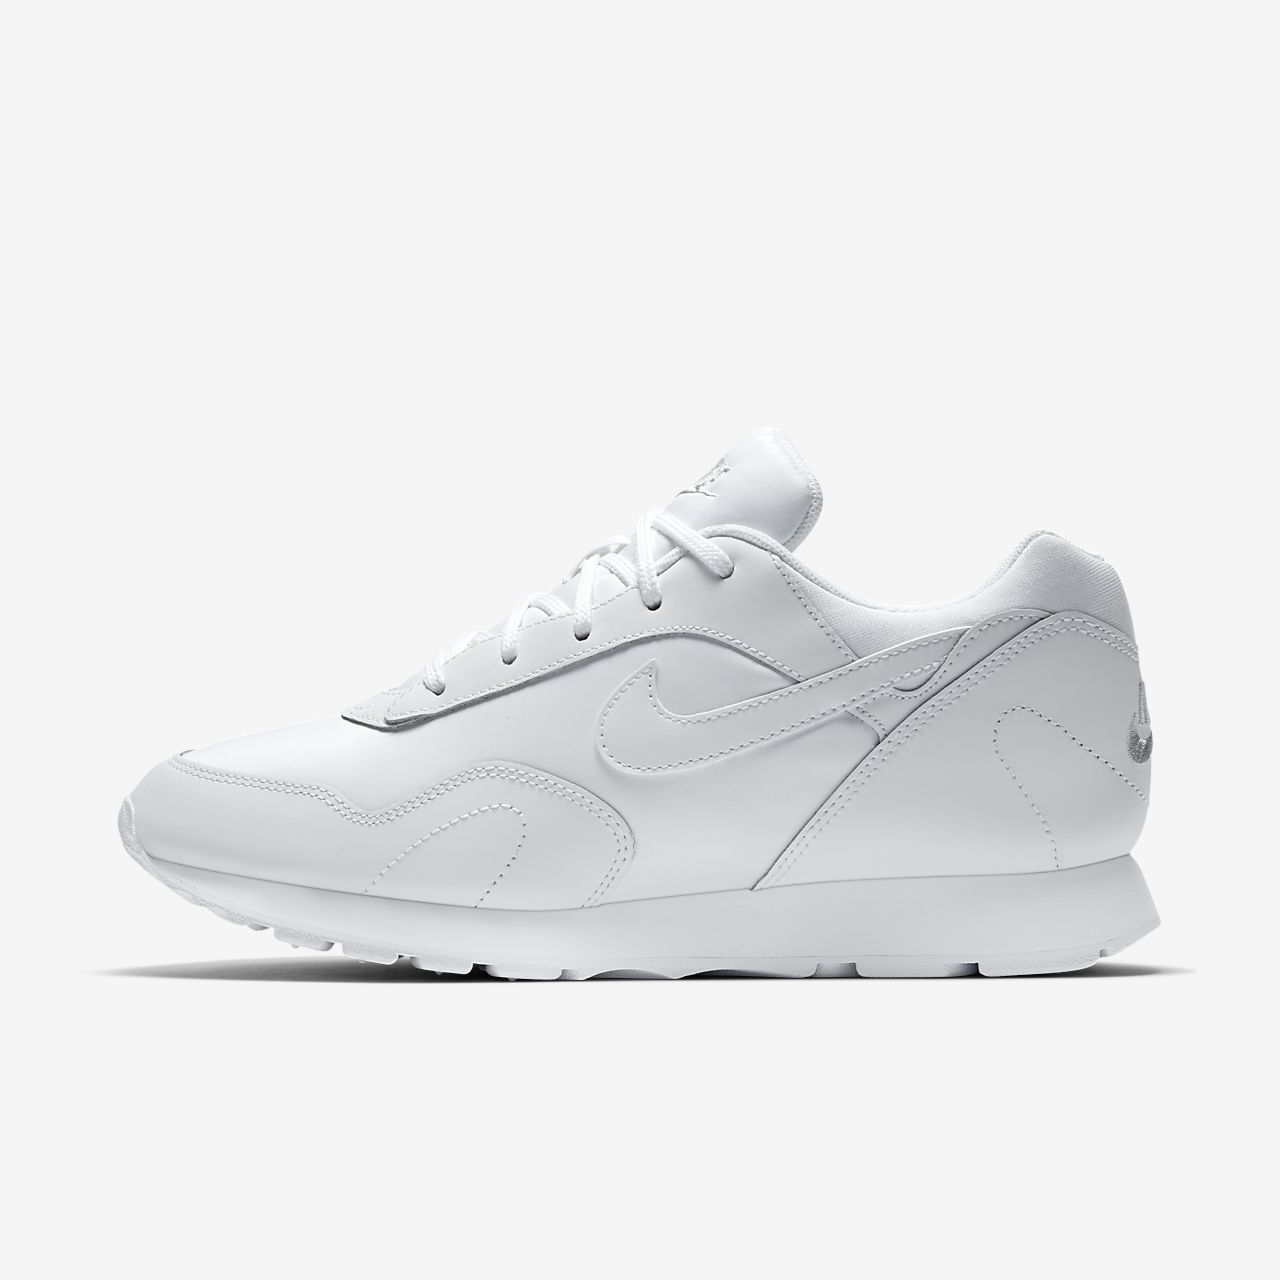 OUTBURST - CALZADO - Sneakers & Deportivas Nike 8wkc7h48